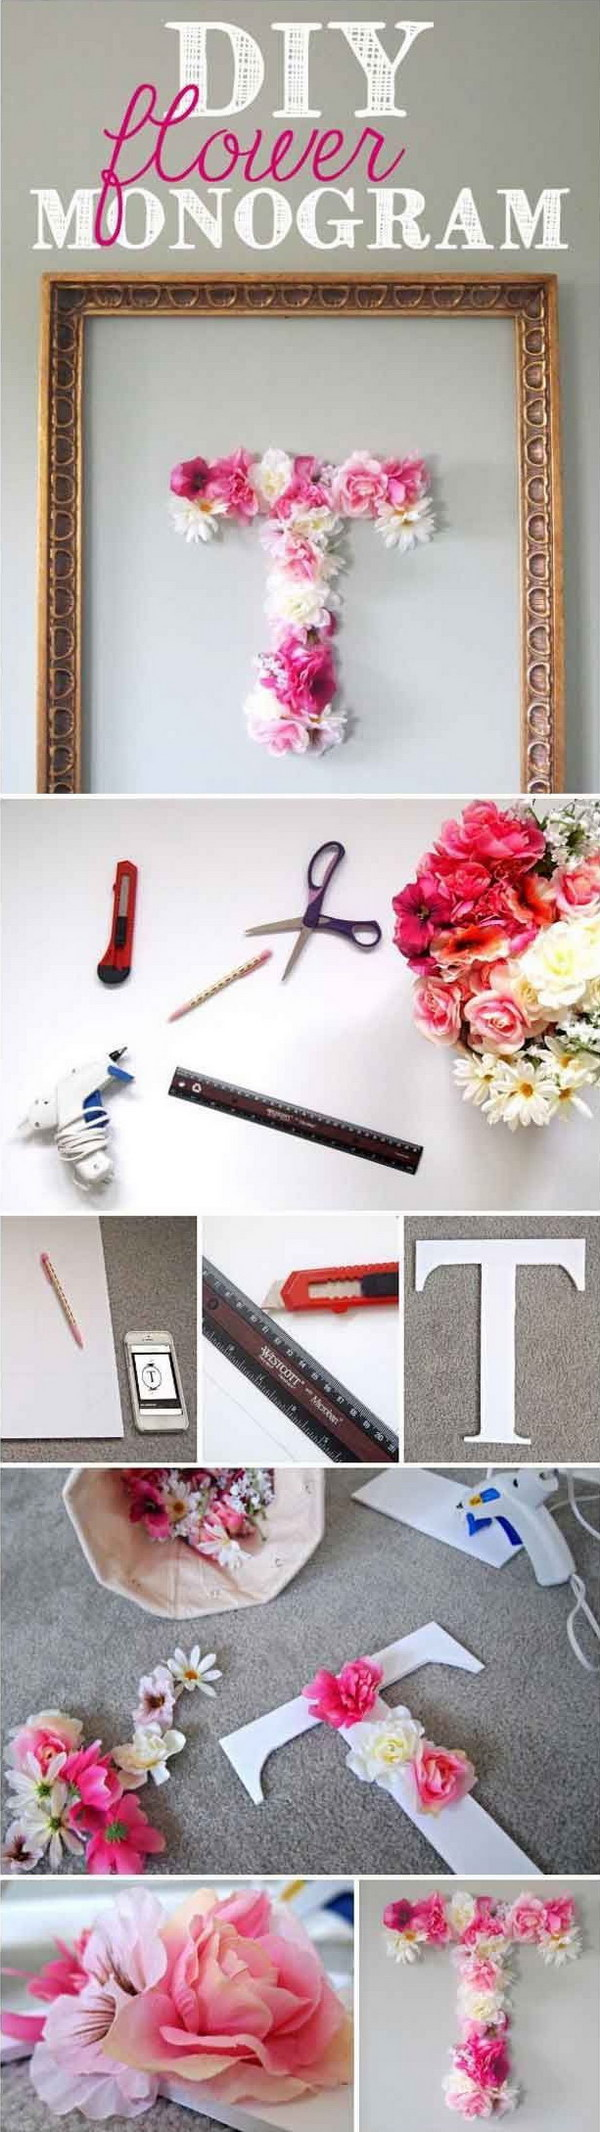 25 DIY Ideas  Tutorials for Teenage Girls Room